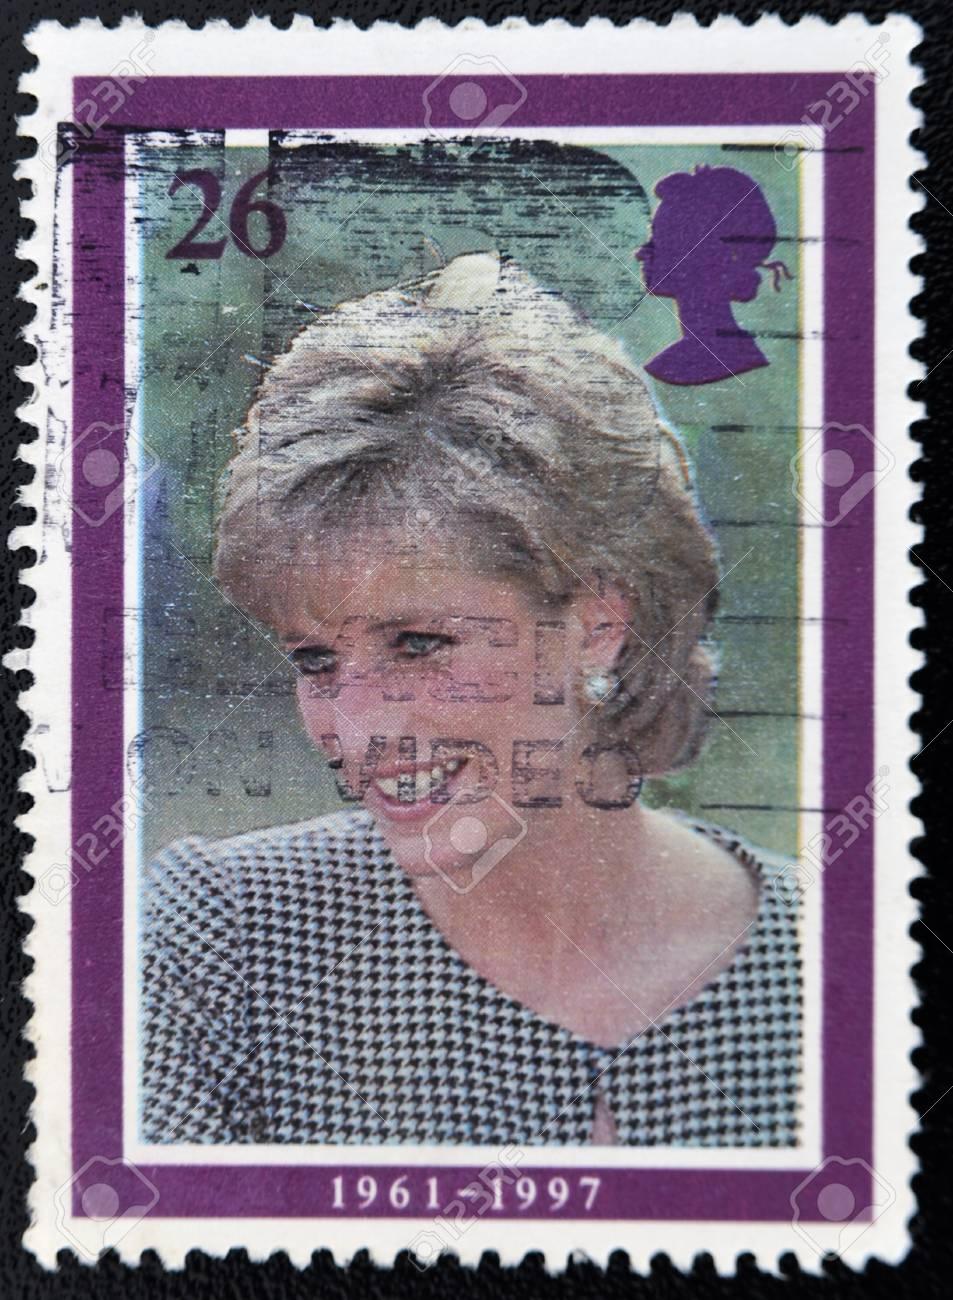 UNITED KINGDOM - CIRCA 1998: British Used Postage Stamp showing Diana, Princess of Wales, circa 1998  Stock Photo - 11099028